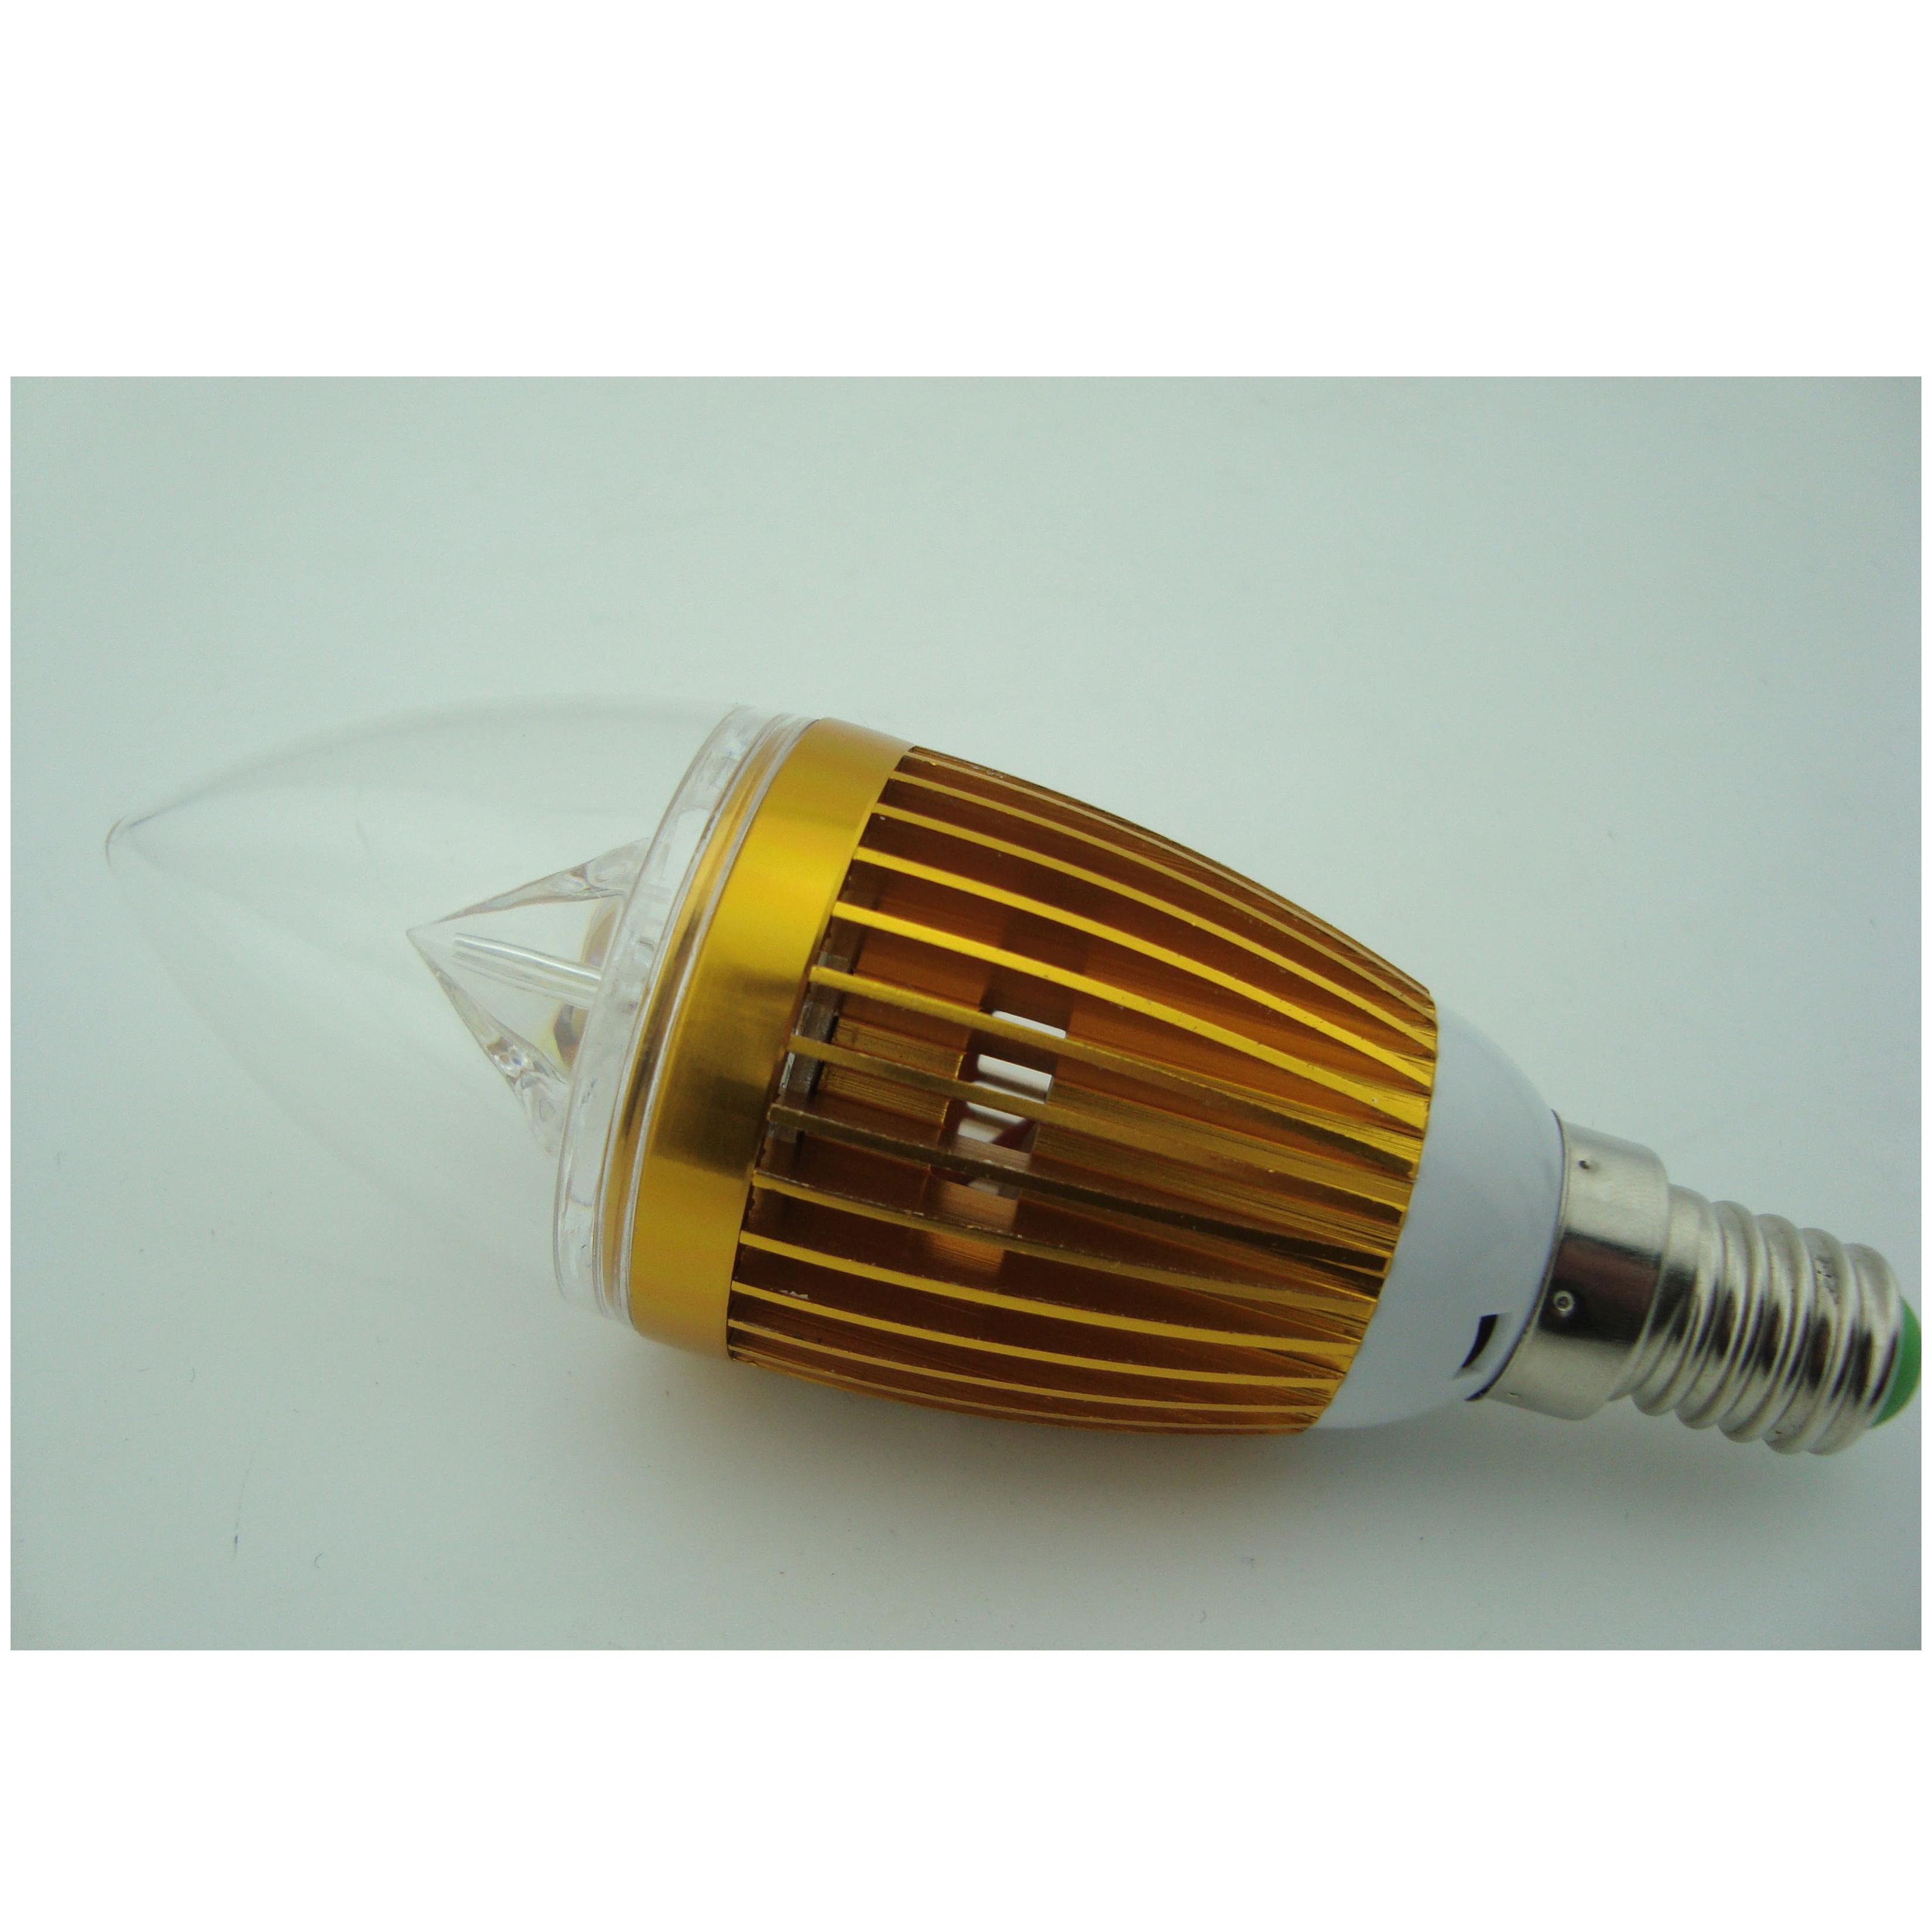 LED Candle Bulb High Quality Gloden Aluminum 1x3W E14 180lm  85-265V LED Global Bulb Light Spotlight Downlight